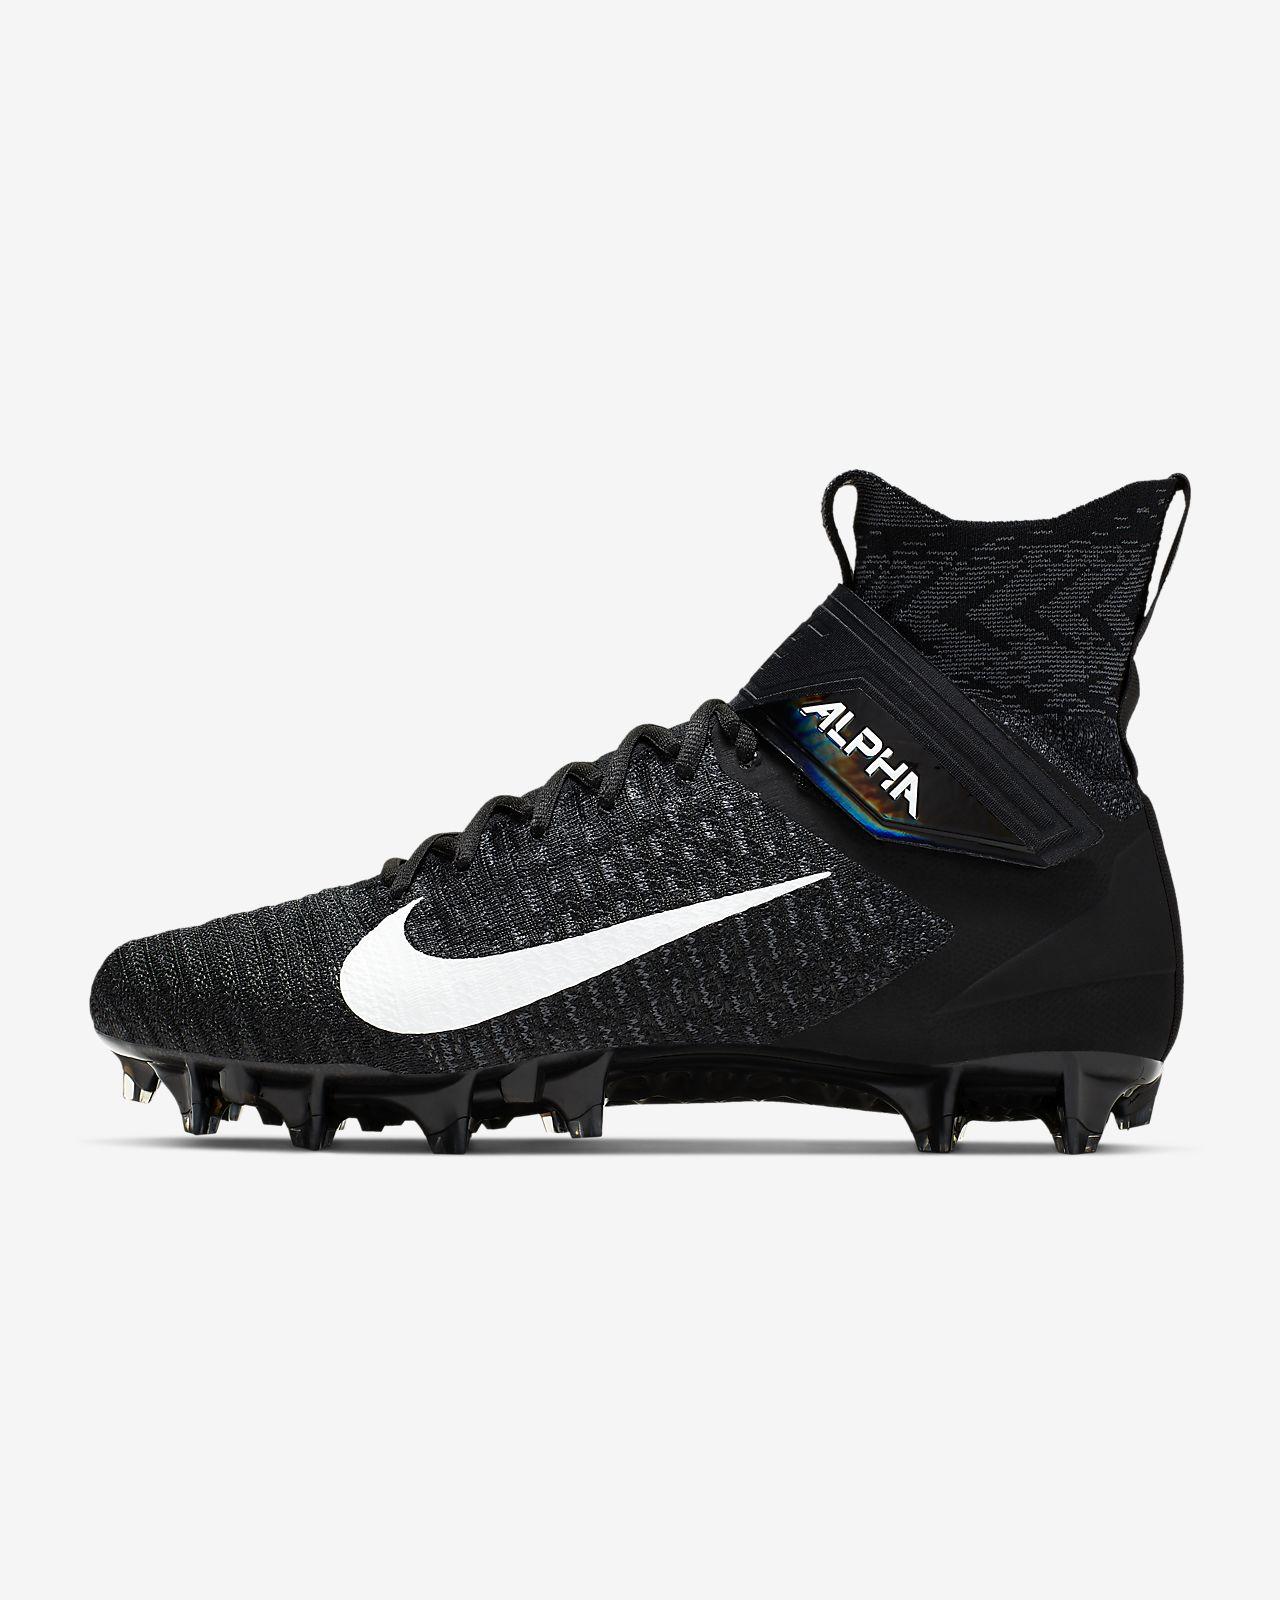 a7b713ee0 Nike Alpha Menace Elite 2 Men s Football Cleat. Nike.com